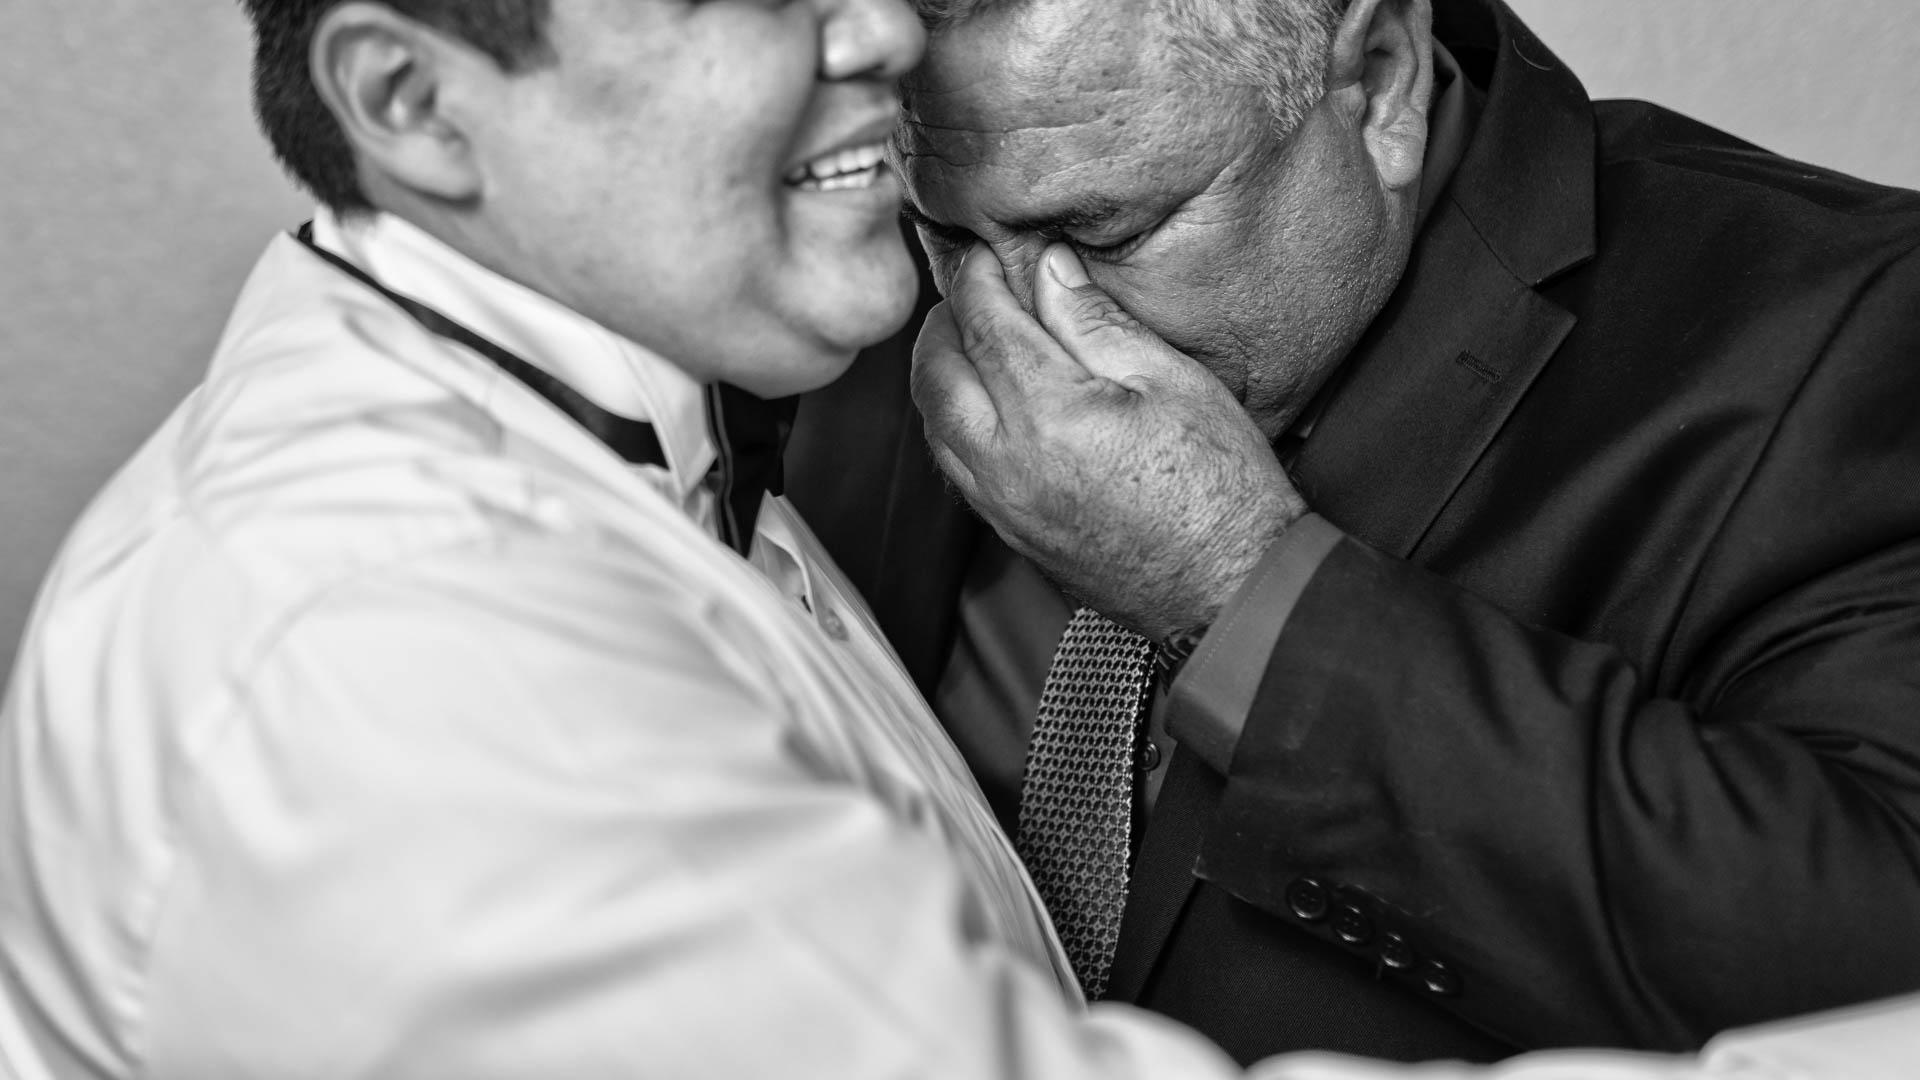 Fotografia de Boda - Foto del papa del novio llorando